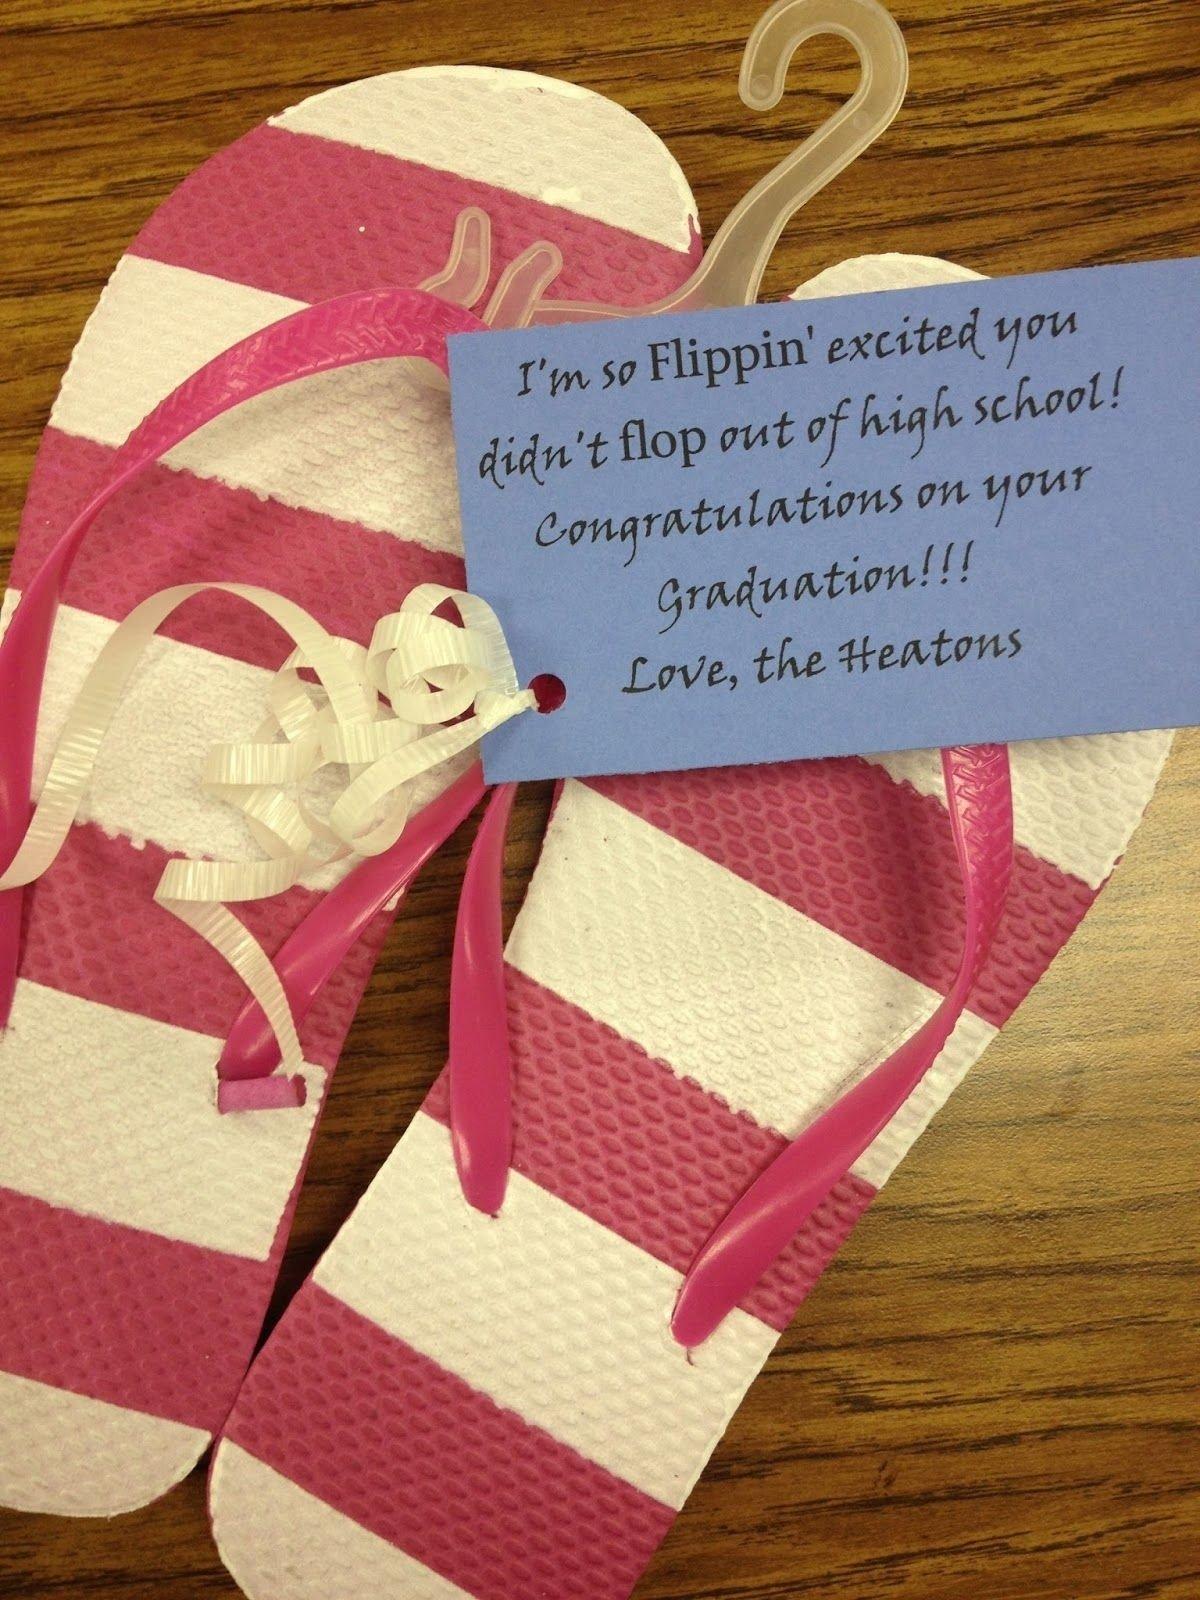 10 Trendy Graduation Gift Ideas For Friends larcie bird graduation summer gift ideas grad ideas pinterest